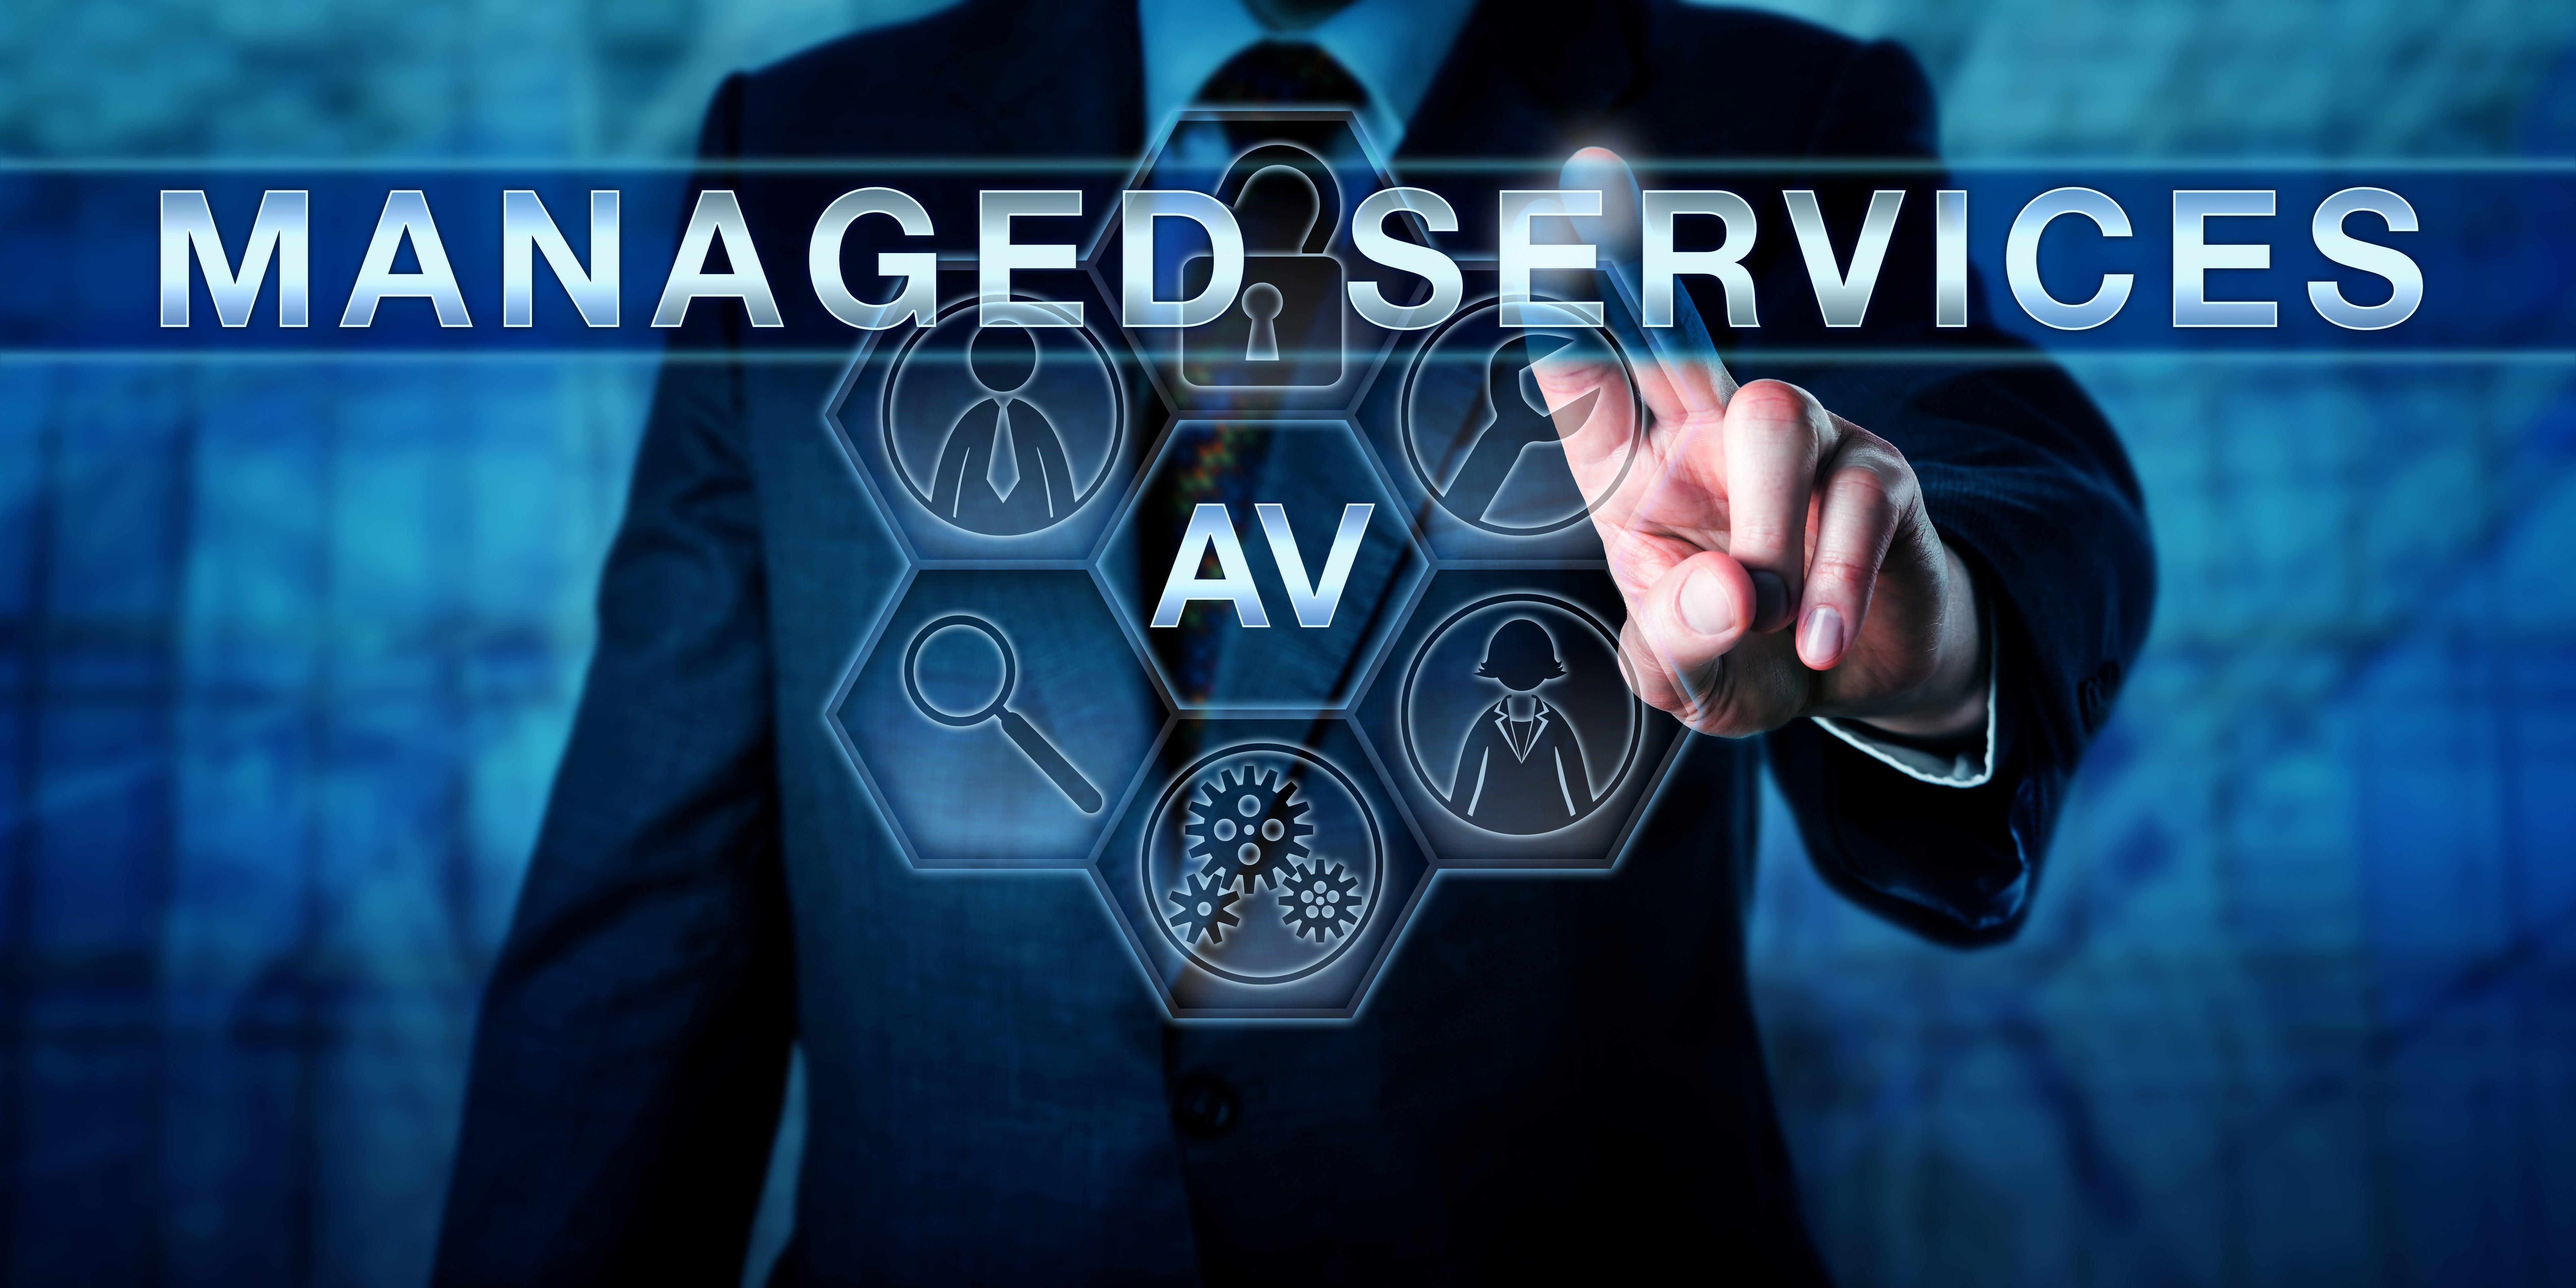 AV Managed Services for IT